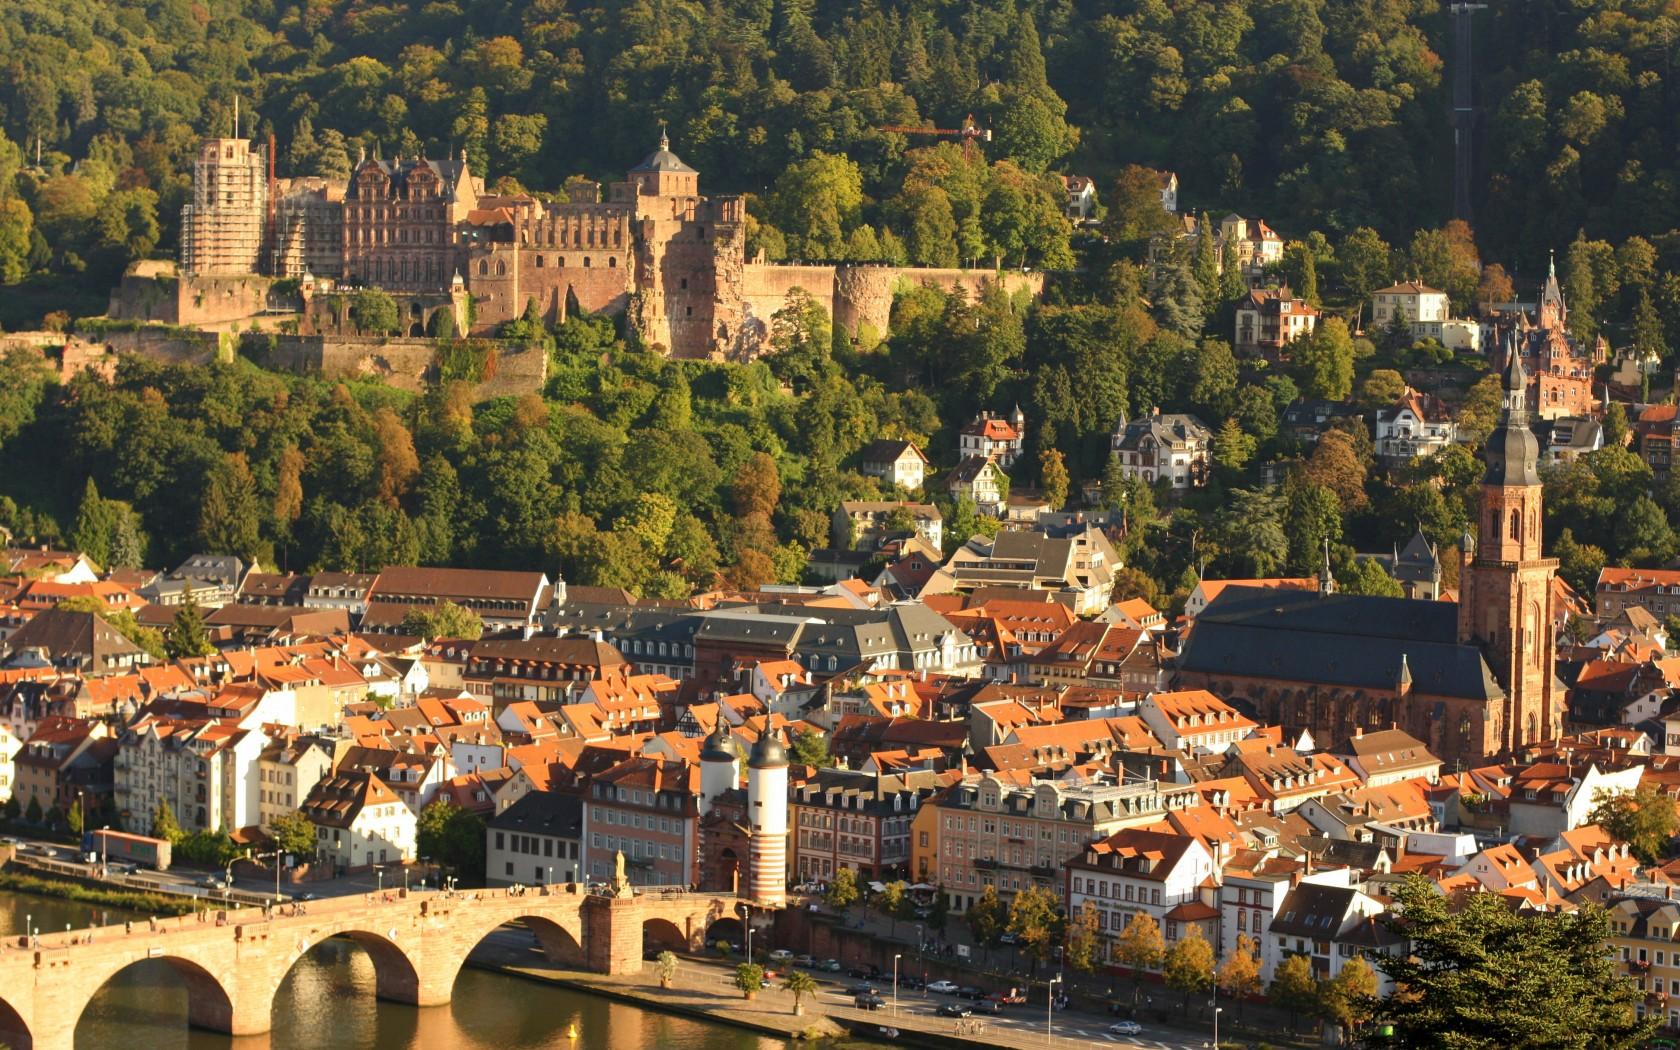 5_Heidelberg_157233749-1680x1050